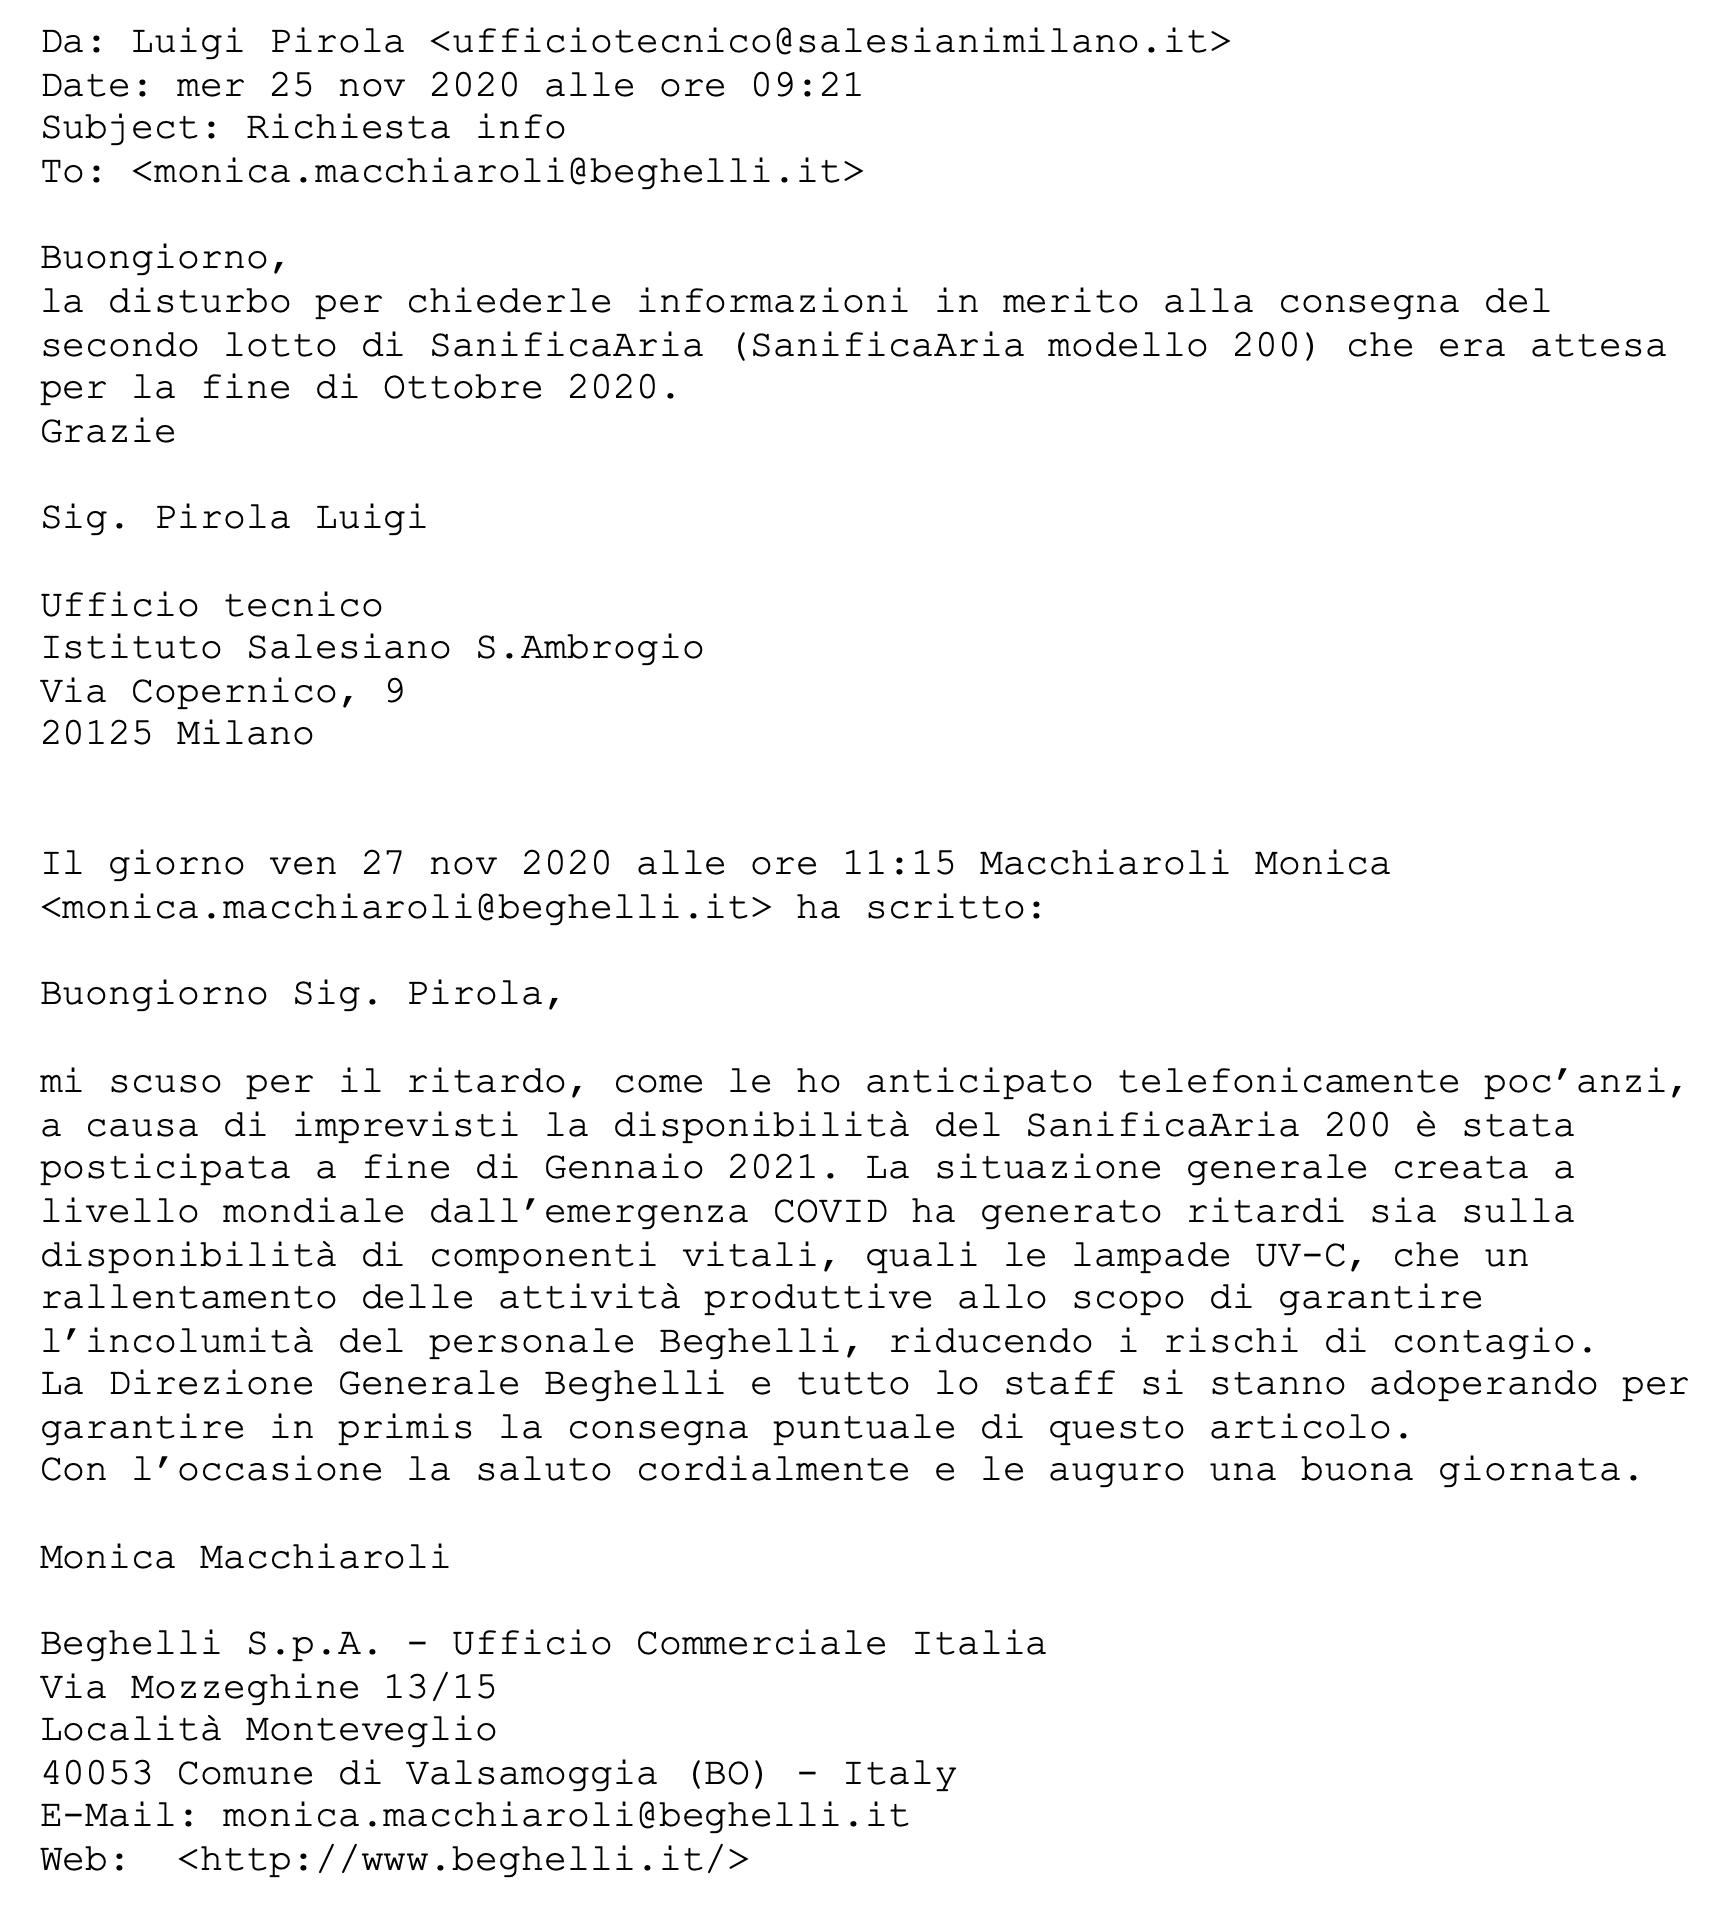 sanificatori Beghelli - Salesiani Milano